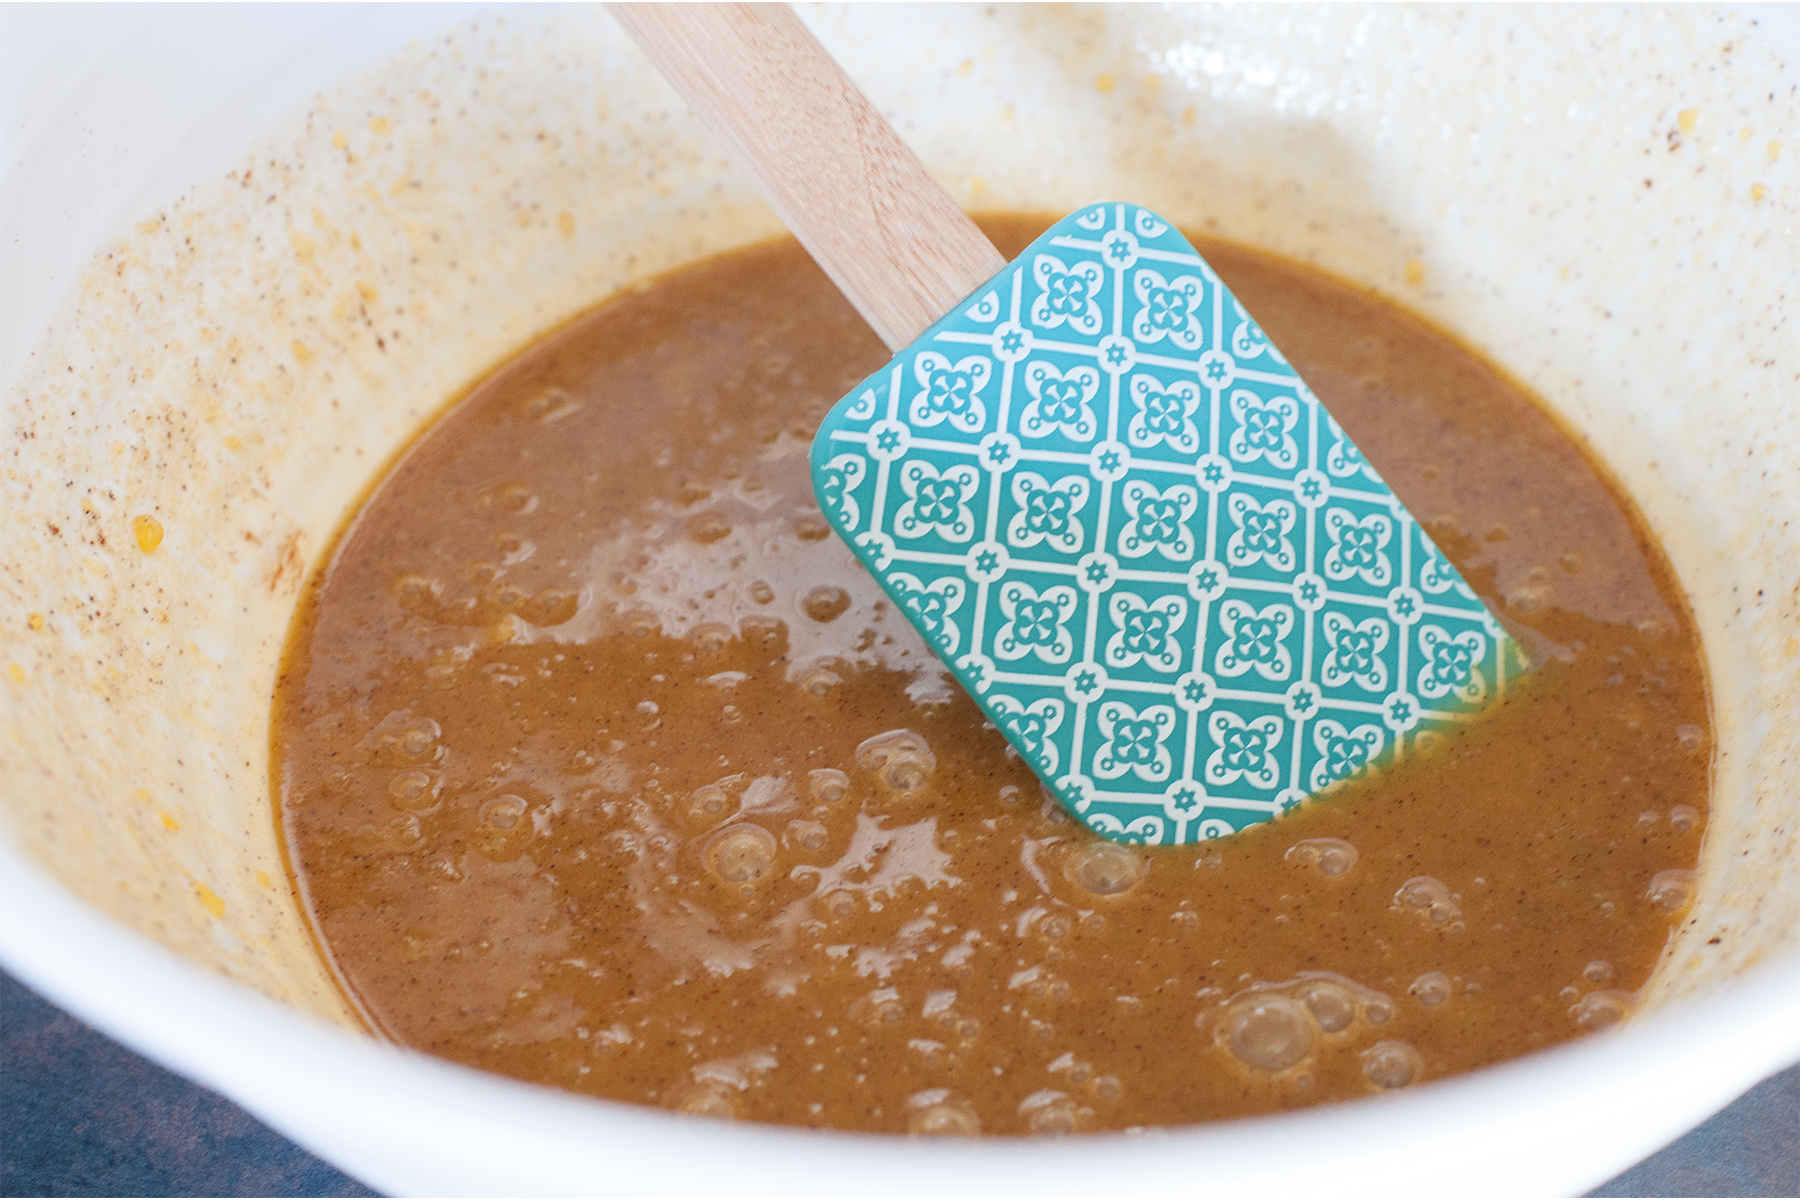 caramel sauce - feature image